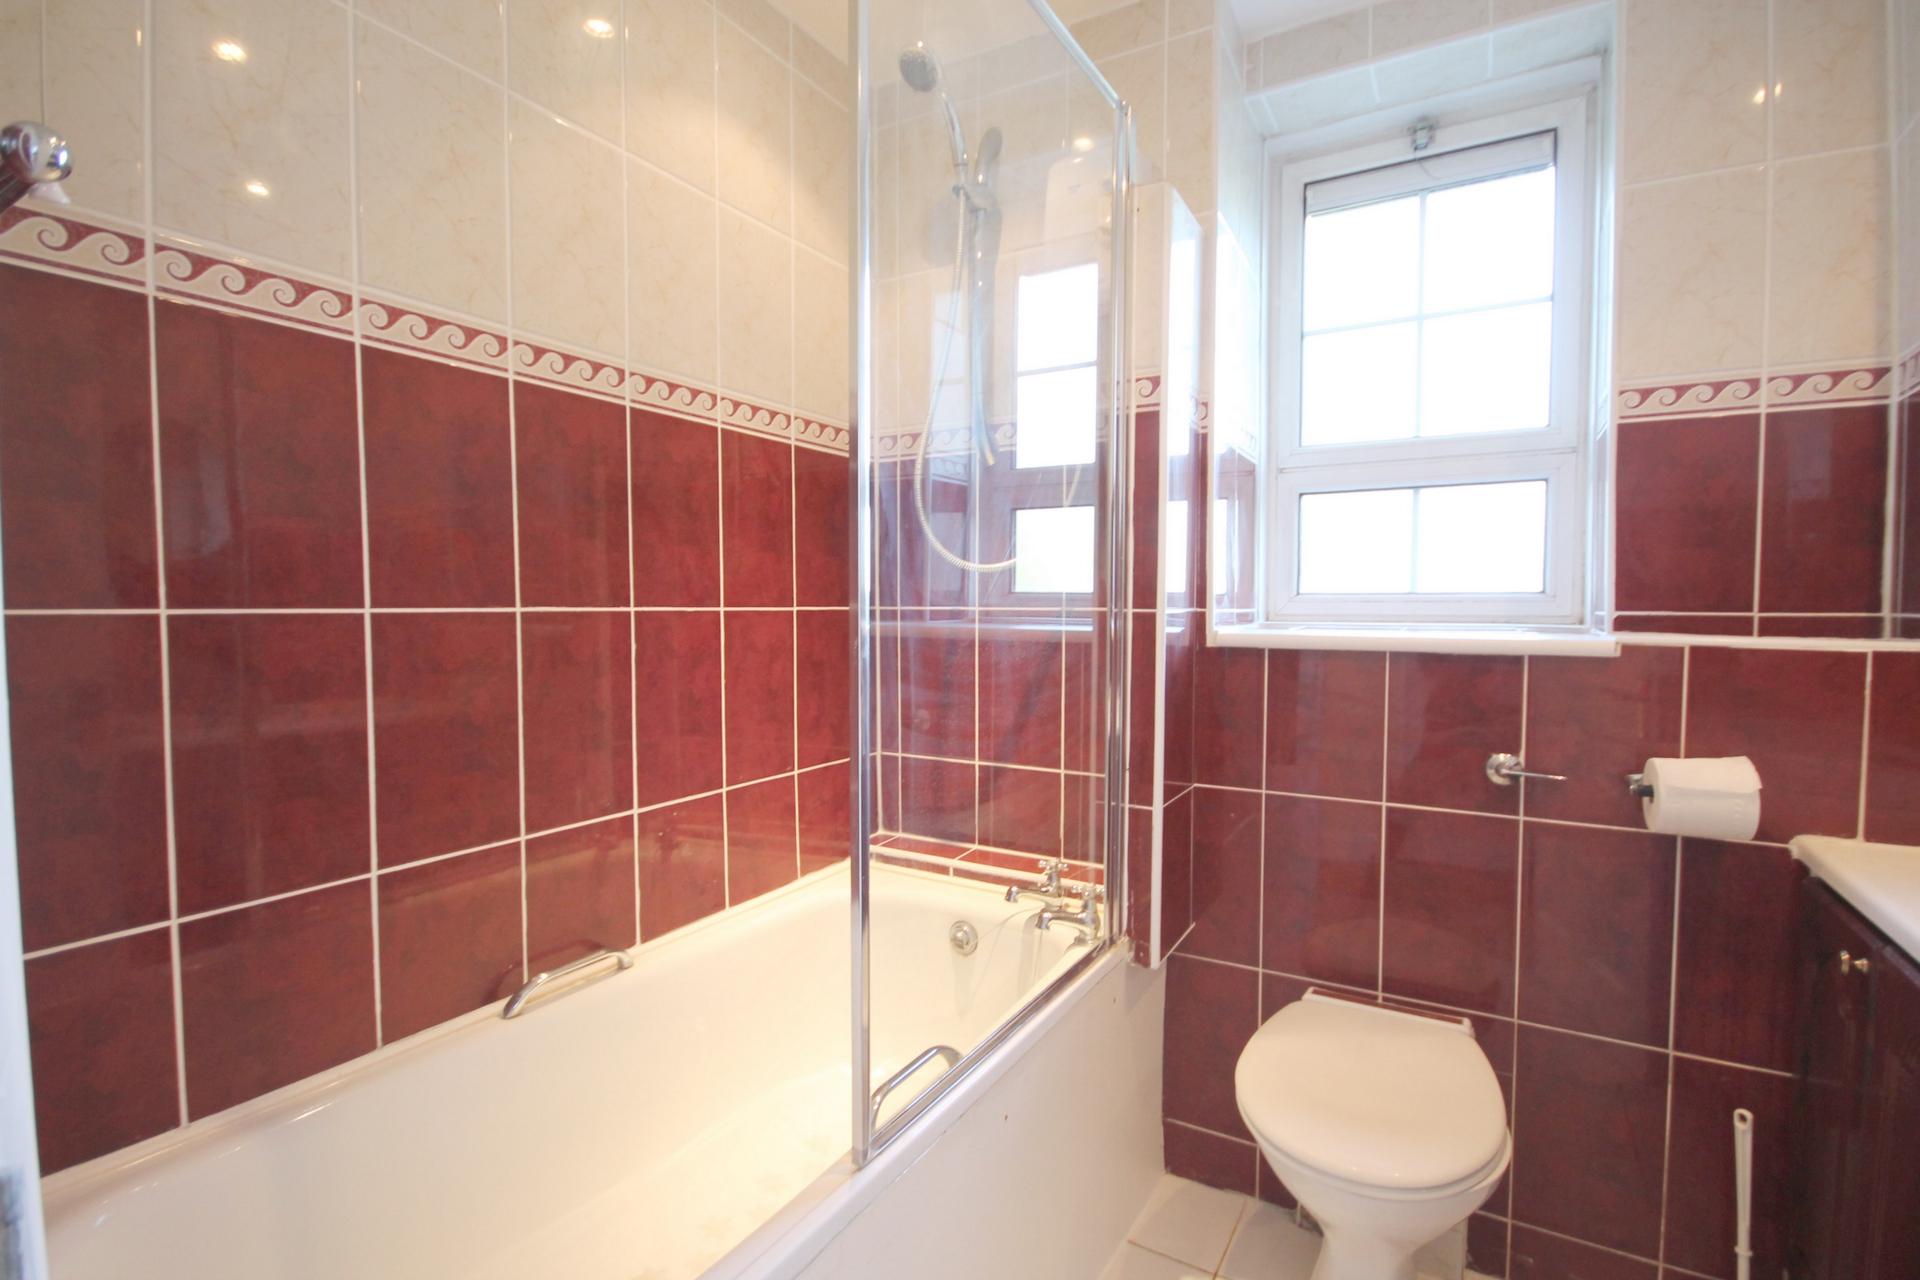 Bathnroom